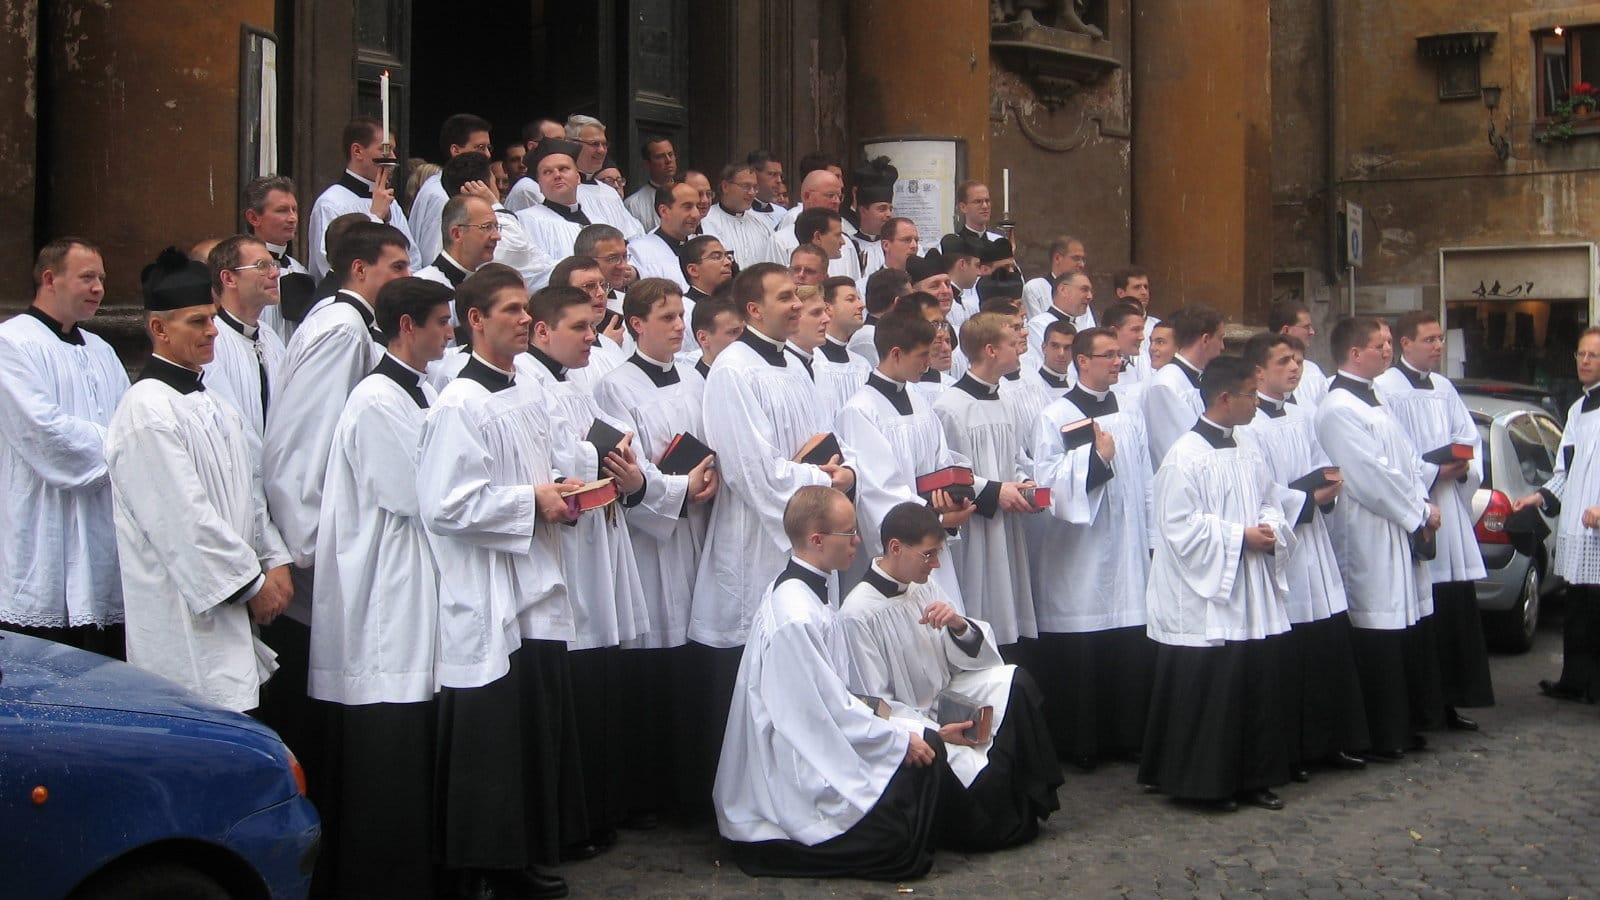 Priester der FSSP vor der Kirche der SS. Trinità dei Pellegrini in Rom [CC BY 3.0 (https://creativecommons.org/licenses/by/3.0)]